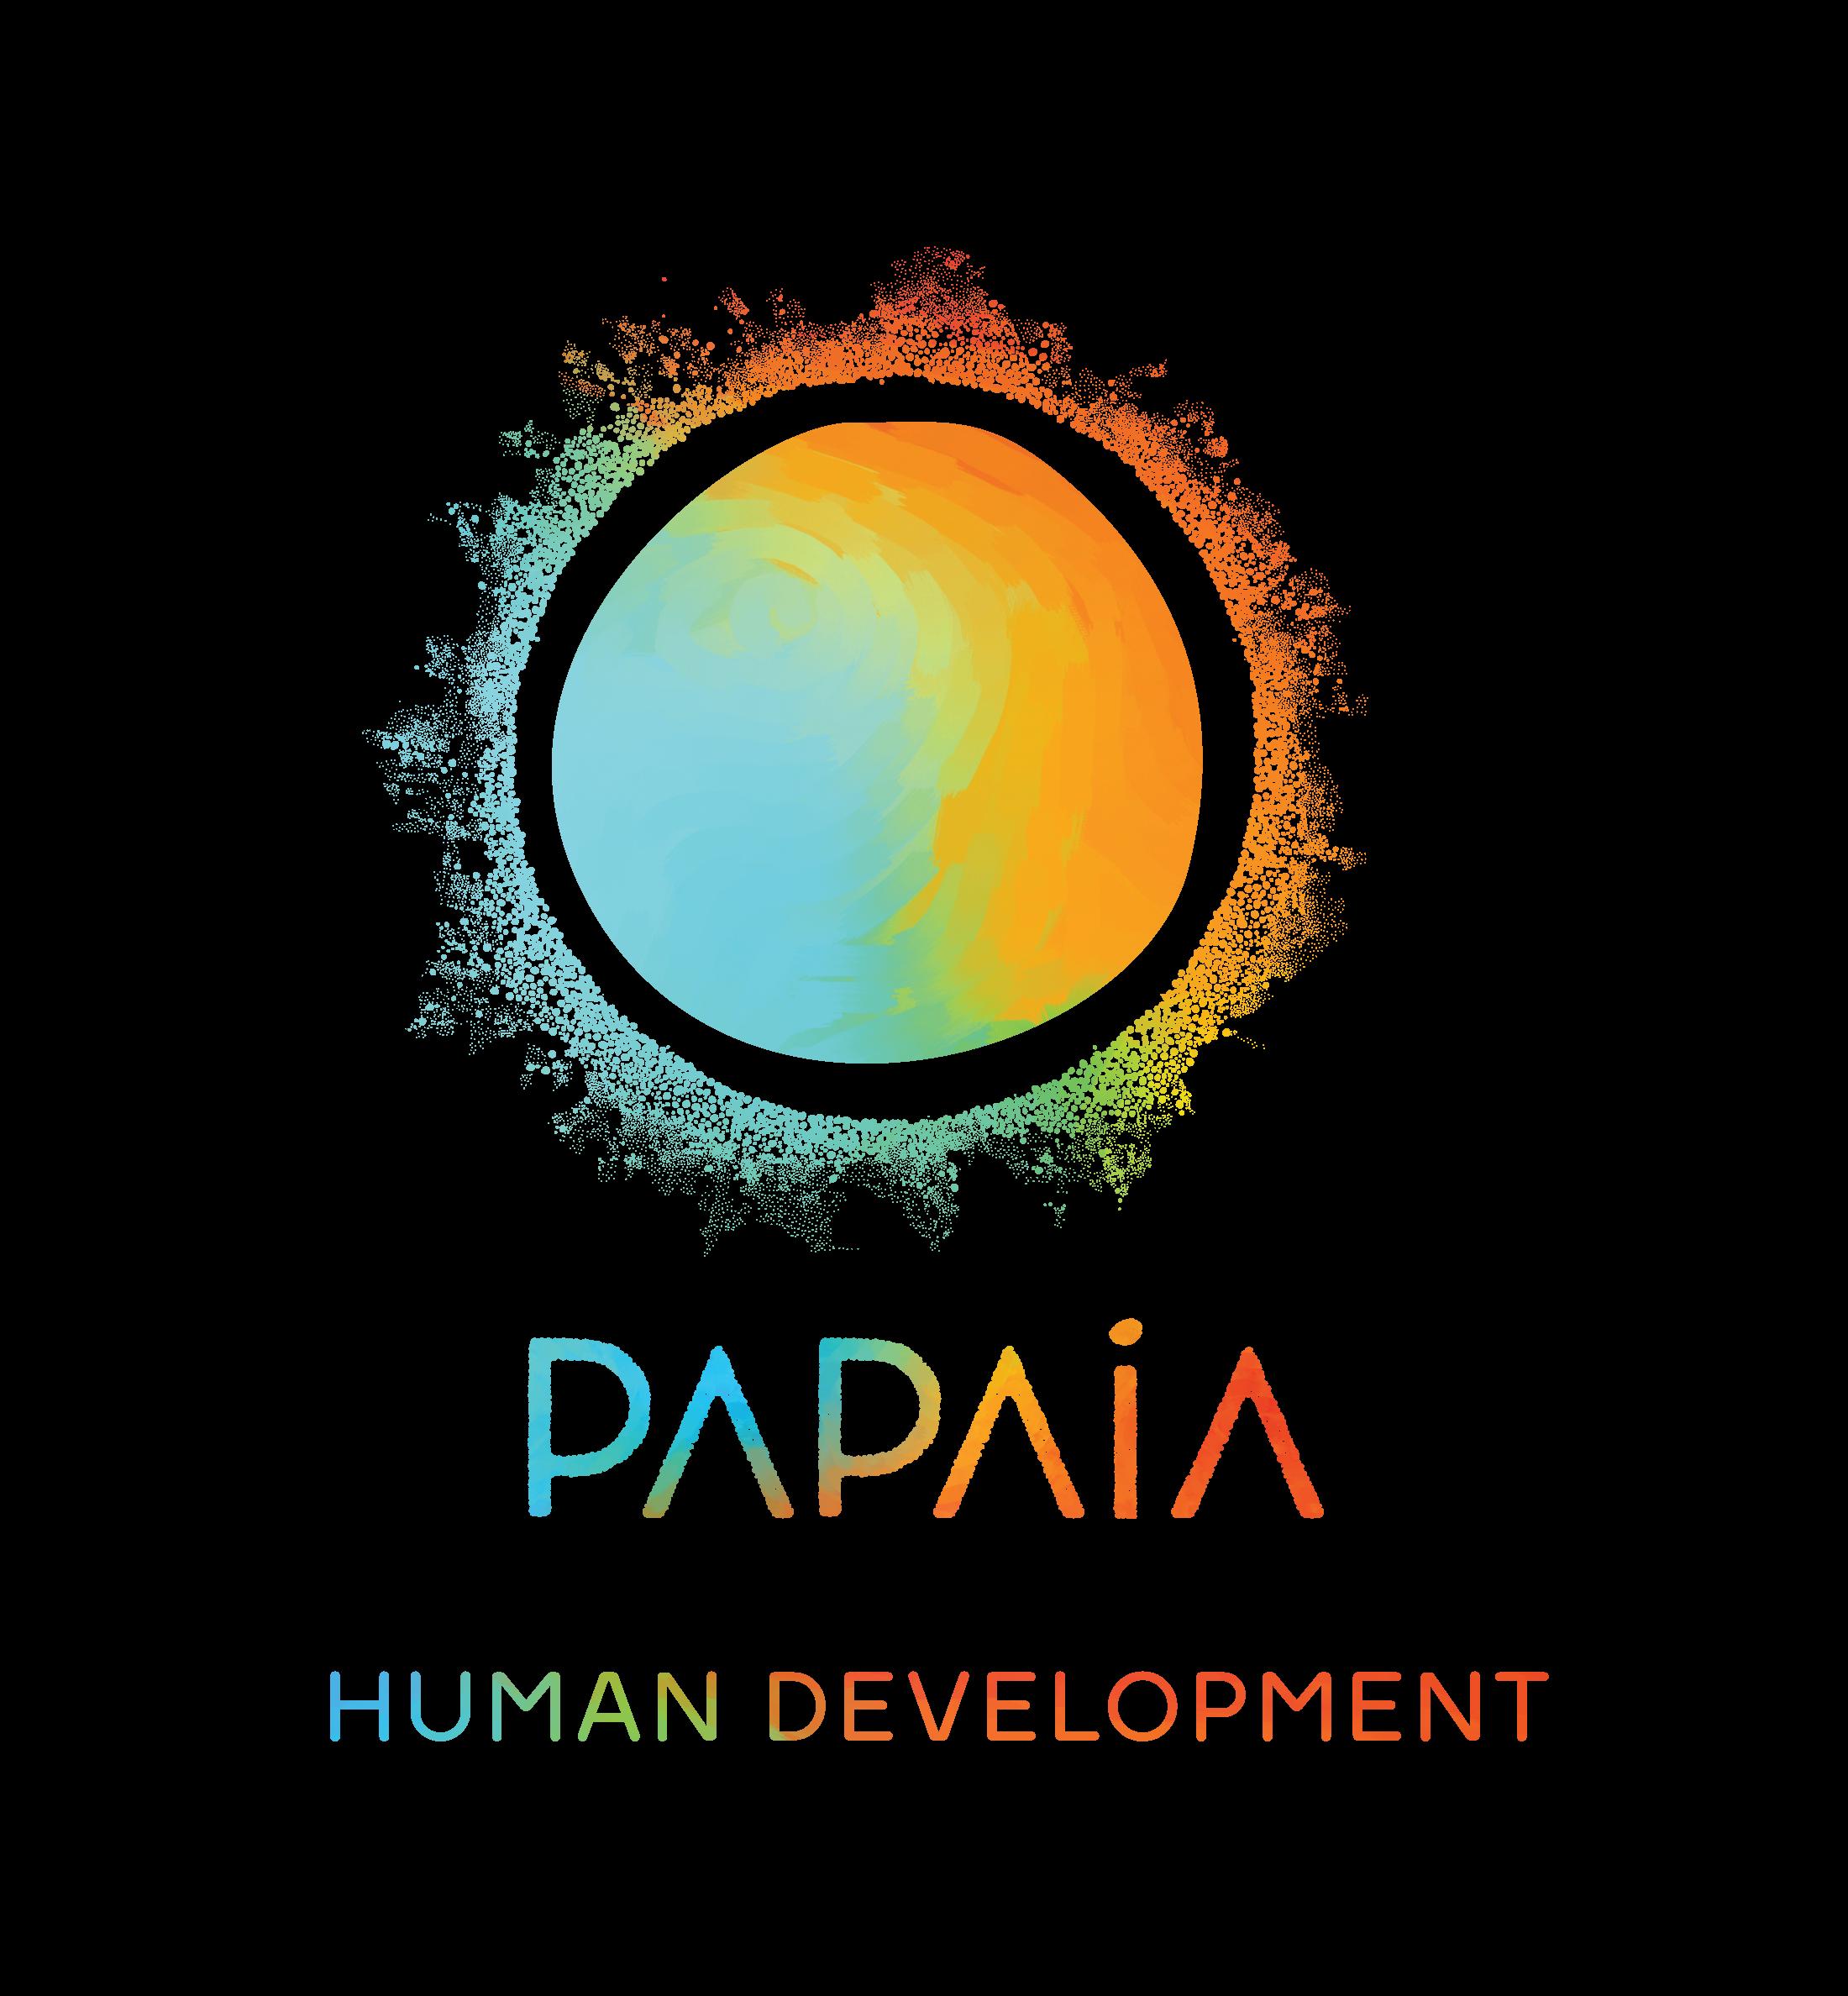 Papaia Human Development